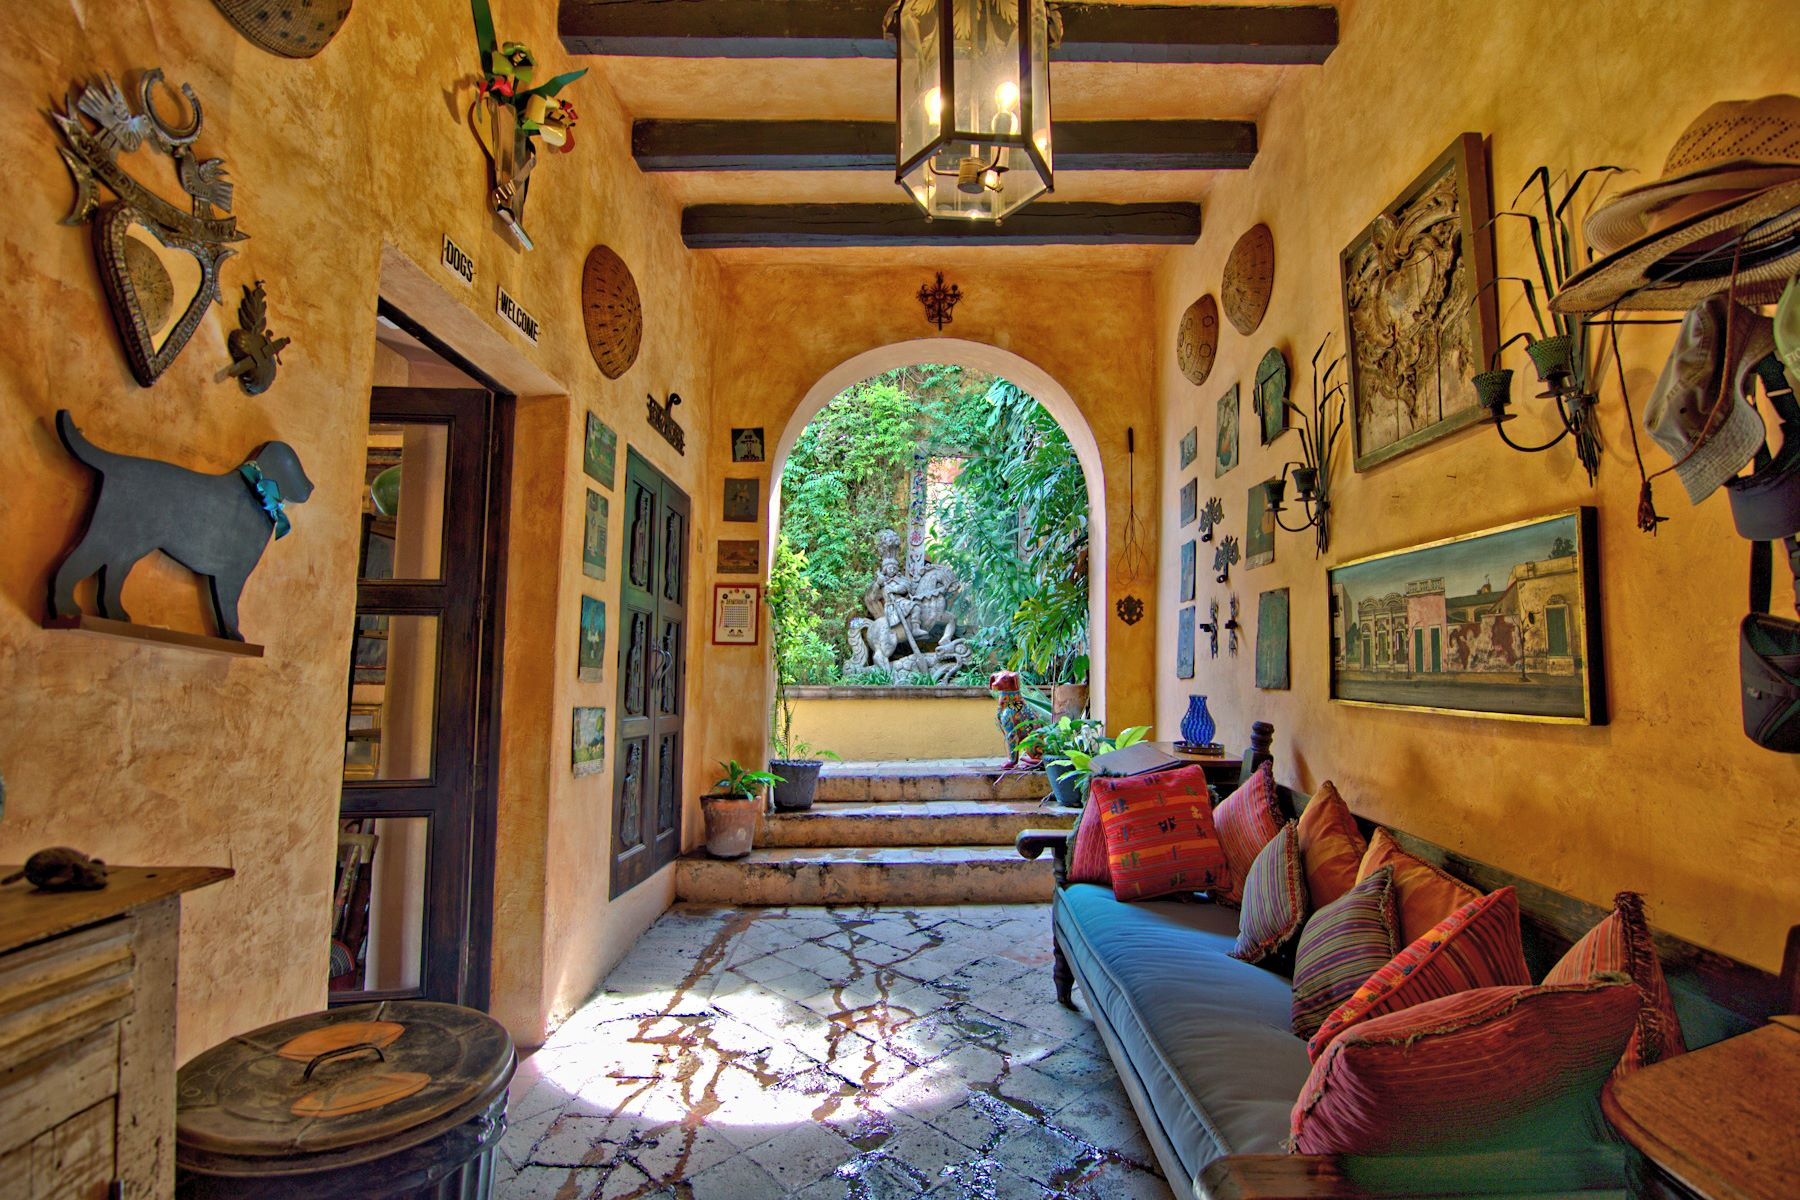 Single Family Home for Sale at Casa Colonial Salida a Queretaro 40 San Miguel De Allende, Guanajuato 37700 Mexico